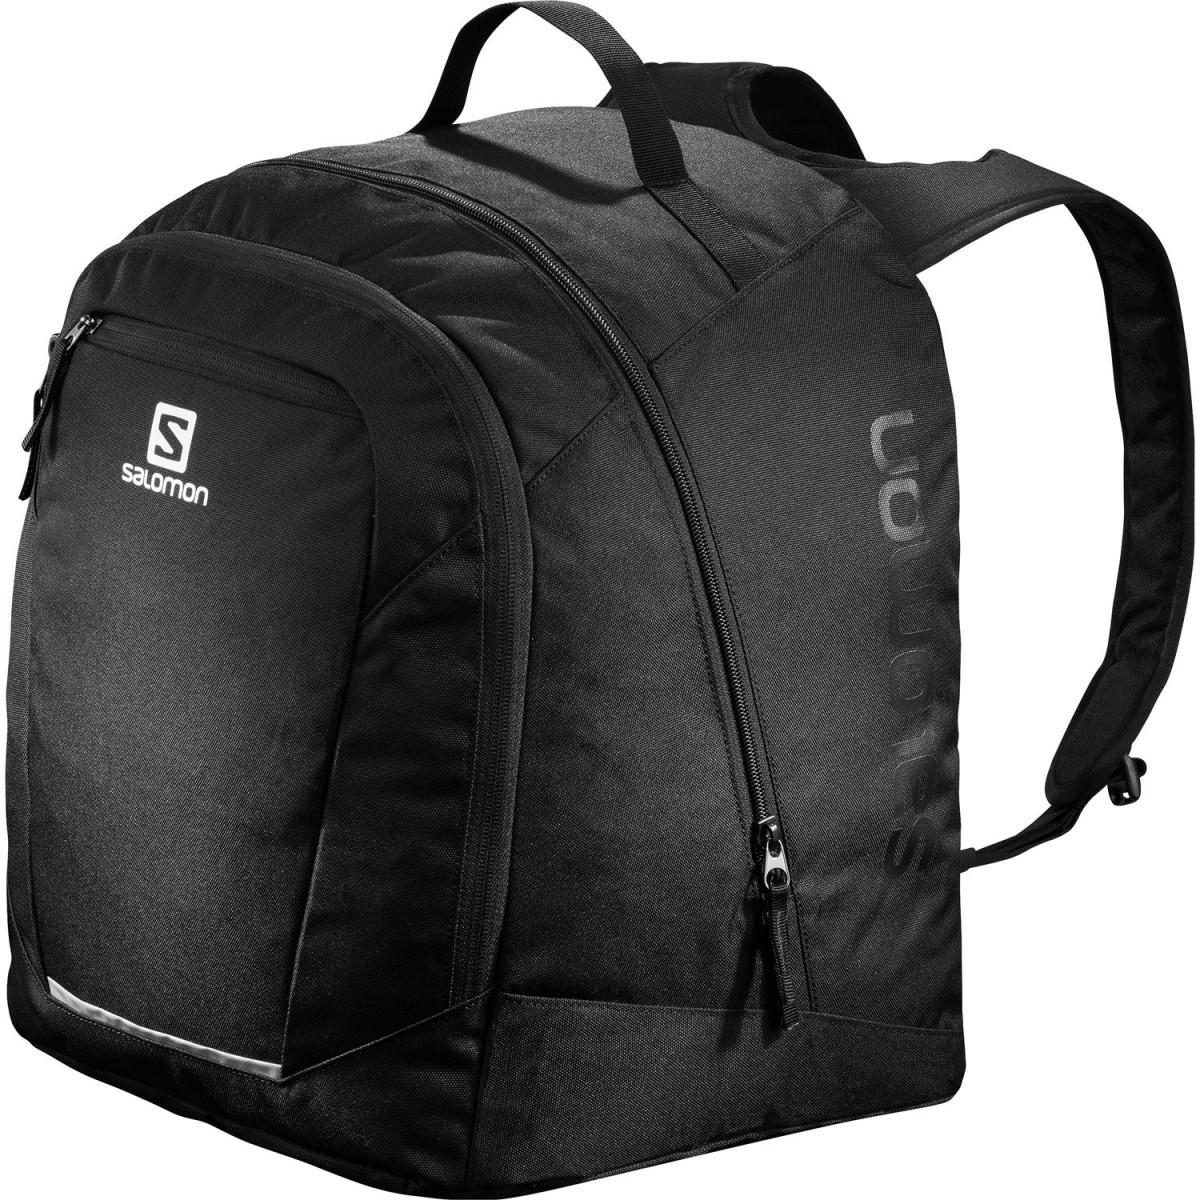 Salomon Original Gear Backpack - čierna